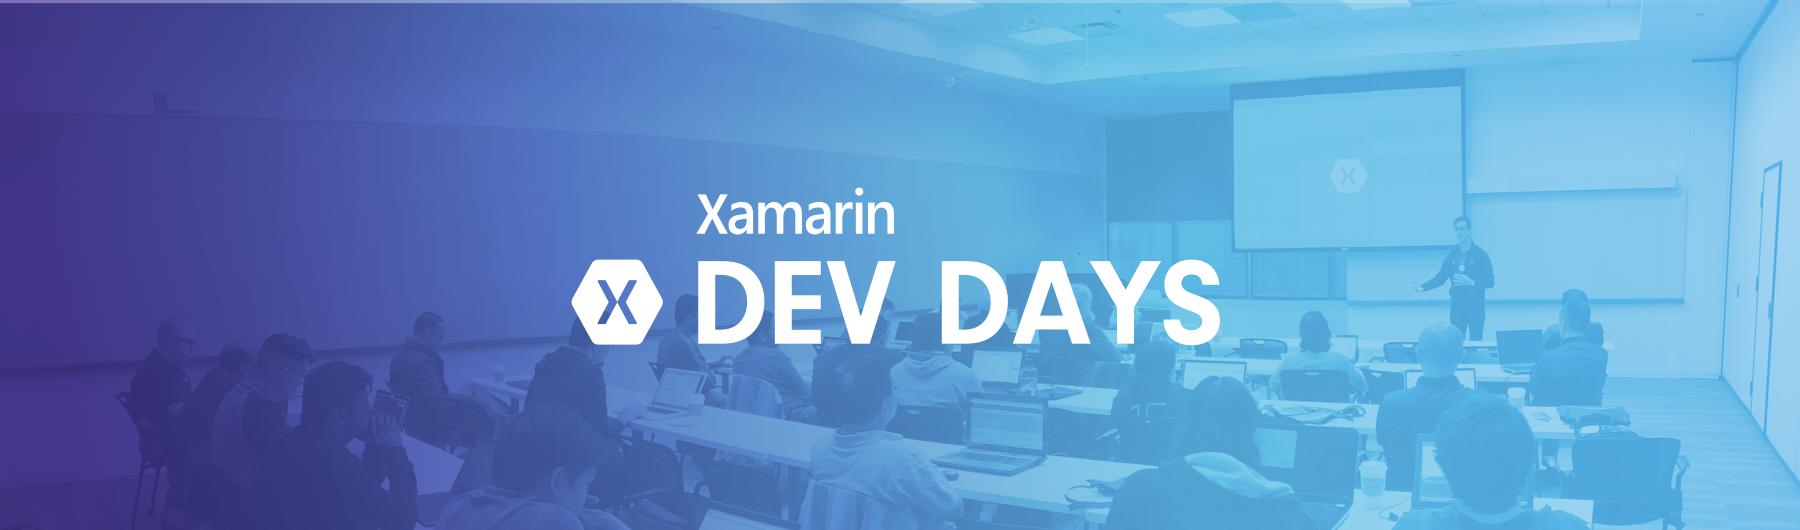 Xamarin Dev Days - Ottawa